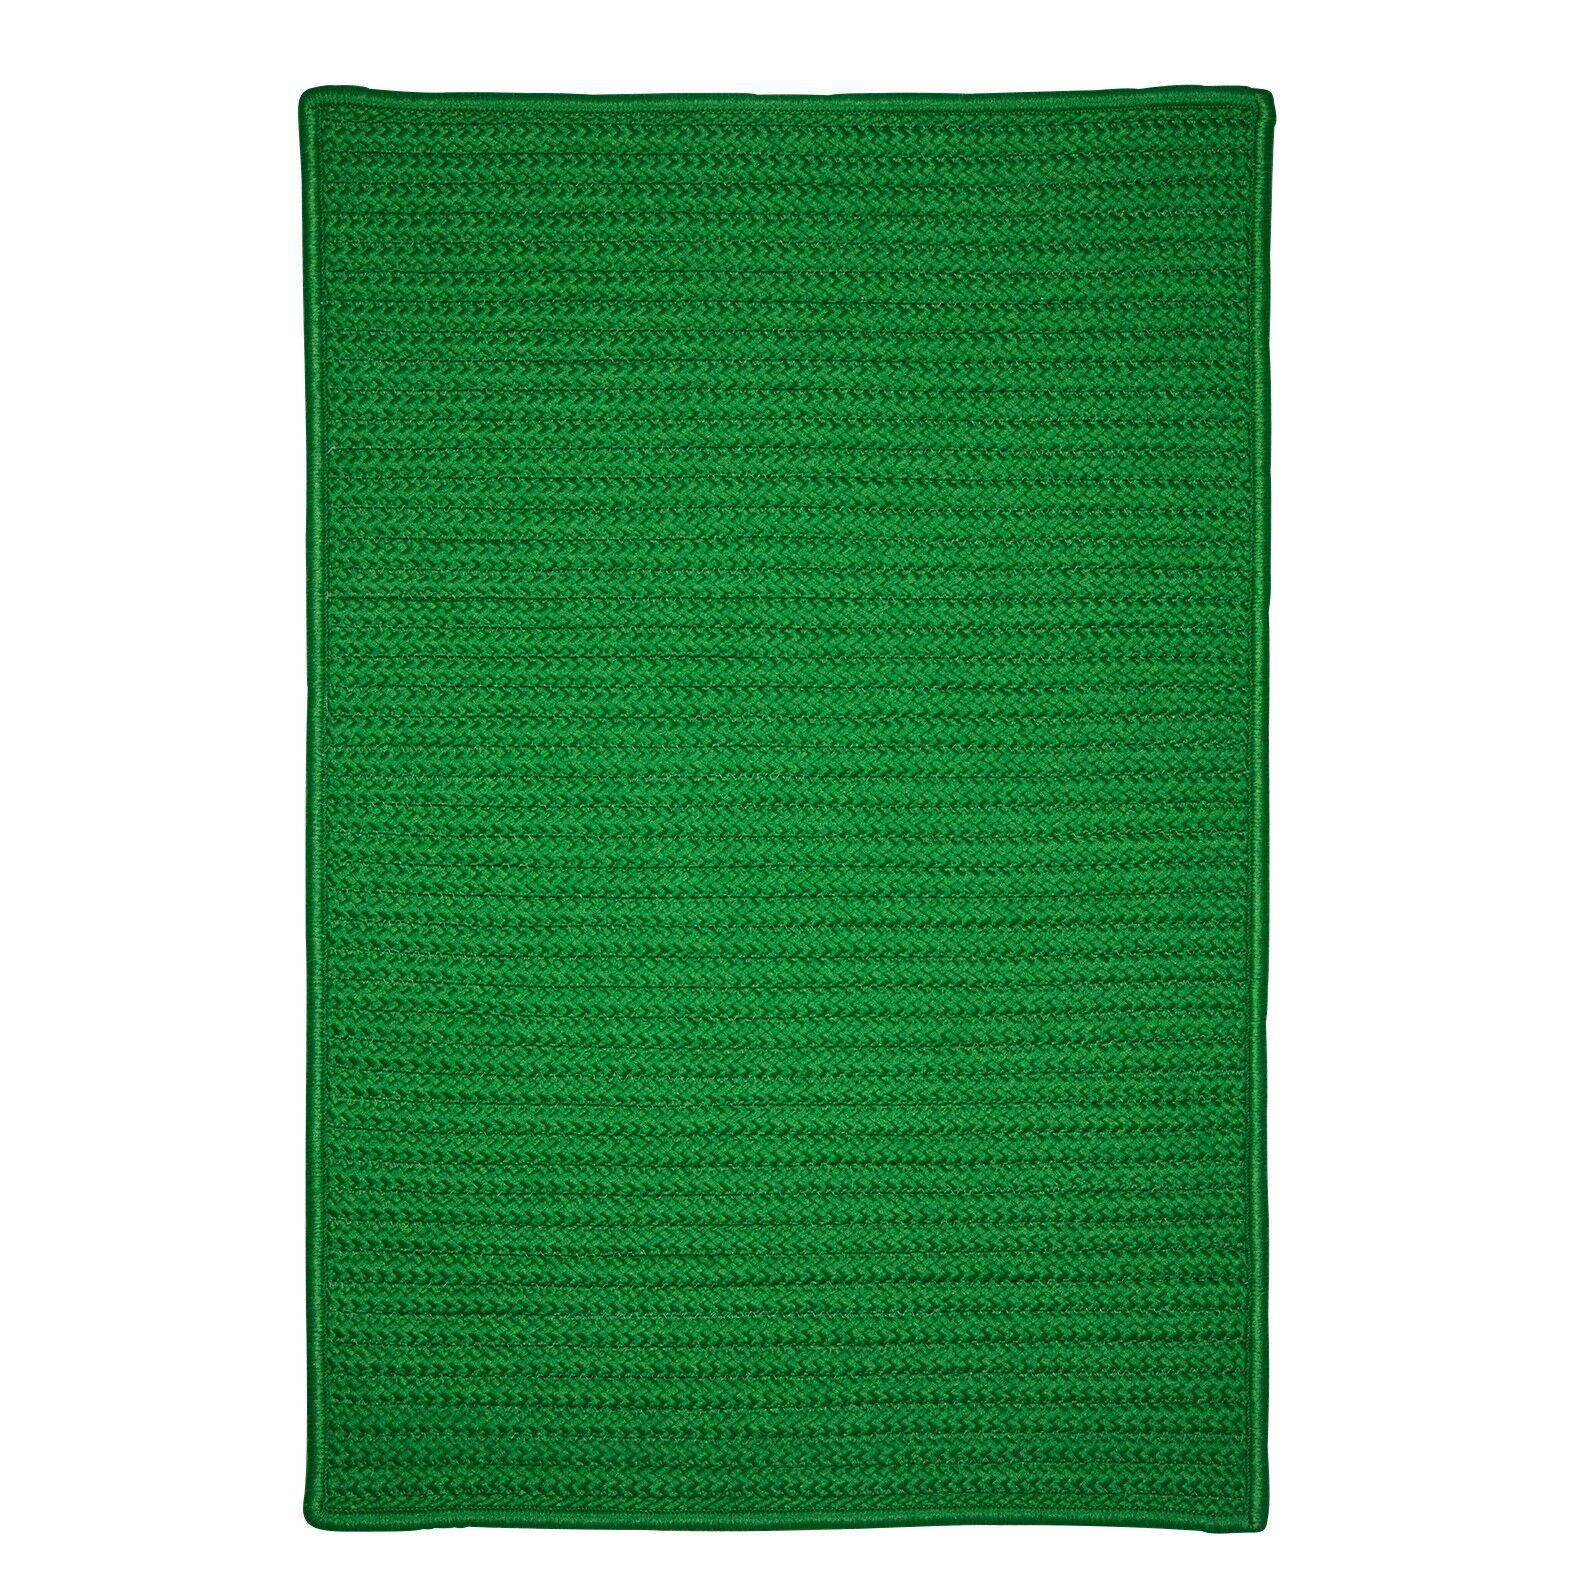 Glasgow Green Indoor/Outdoor Area Rug Rug Size: Rectangle 8' x 11'